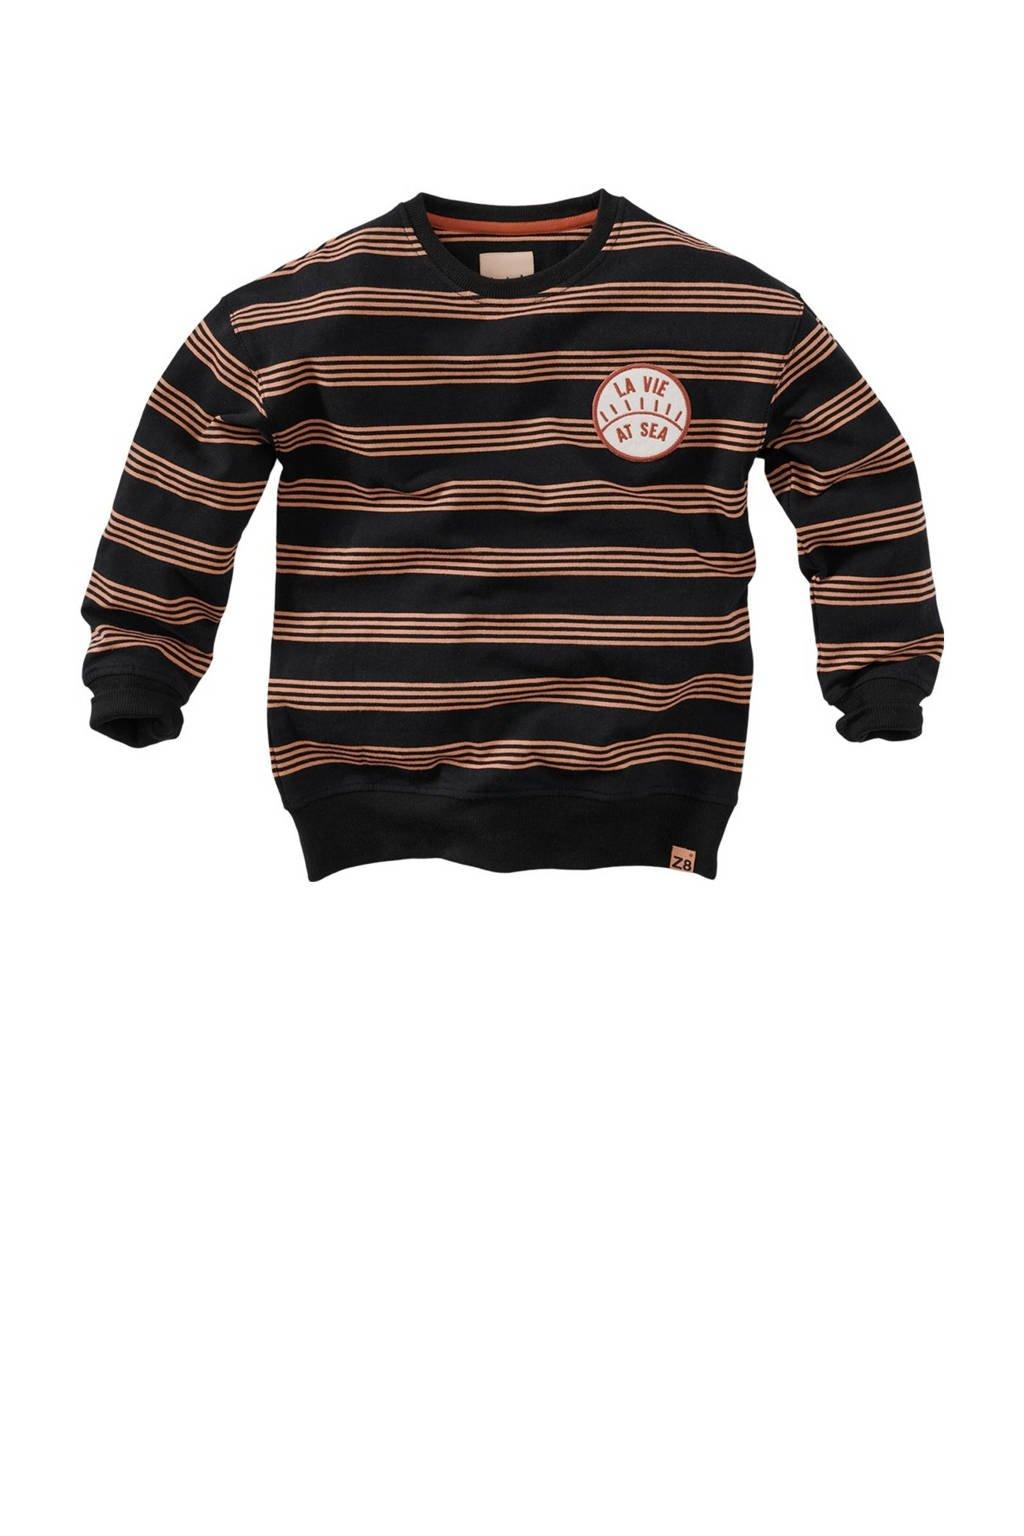 Z8 gestreepte sweater Lou S21 zwart/bruin, Zwart/bruin